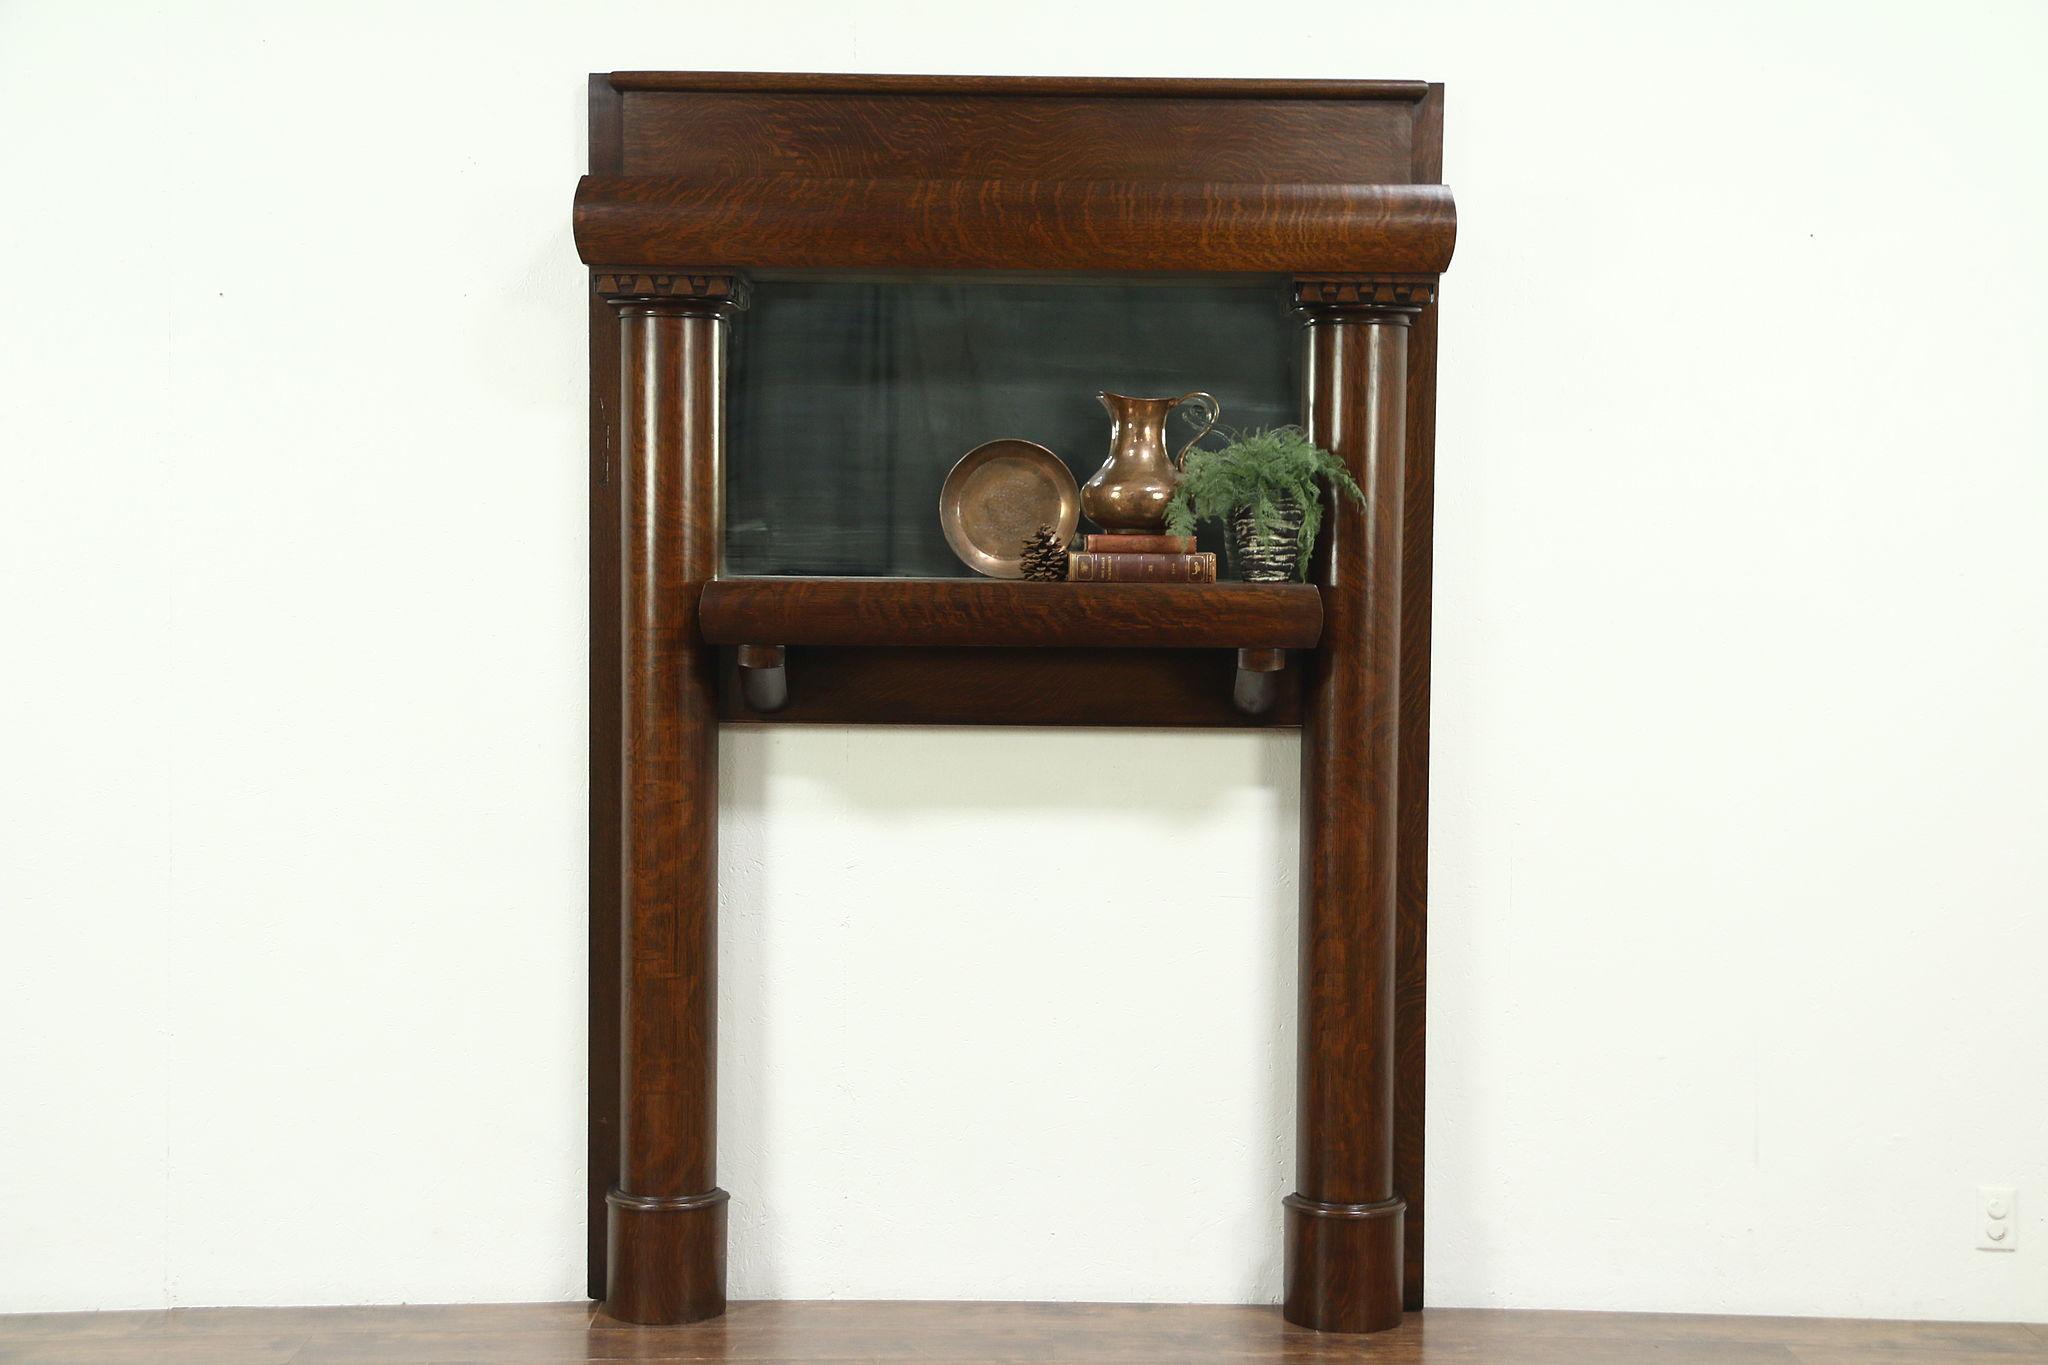 Oak Antique Architectural Salvage Fireplace Mantel Signed Titanic